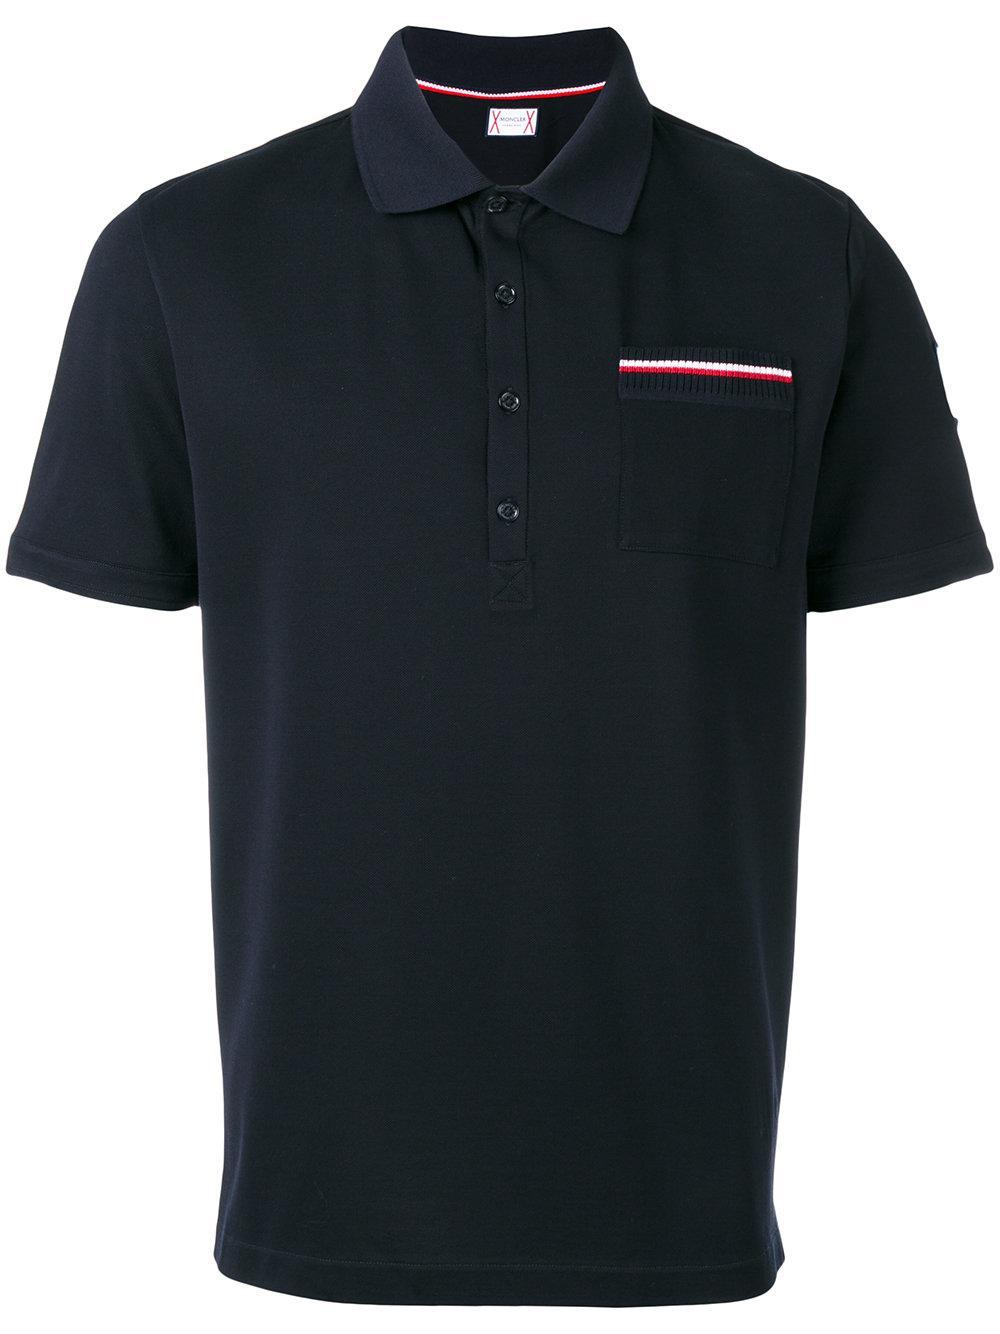 Moncler gamme bleu chest pocket polo shirt men for Men s polo shirts with chest pocket